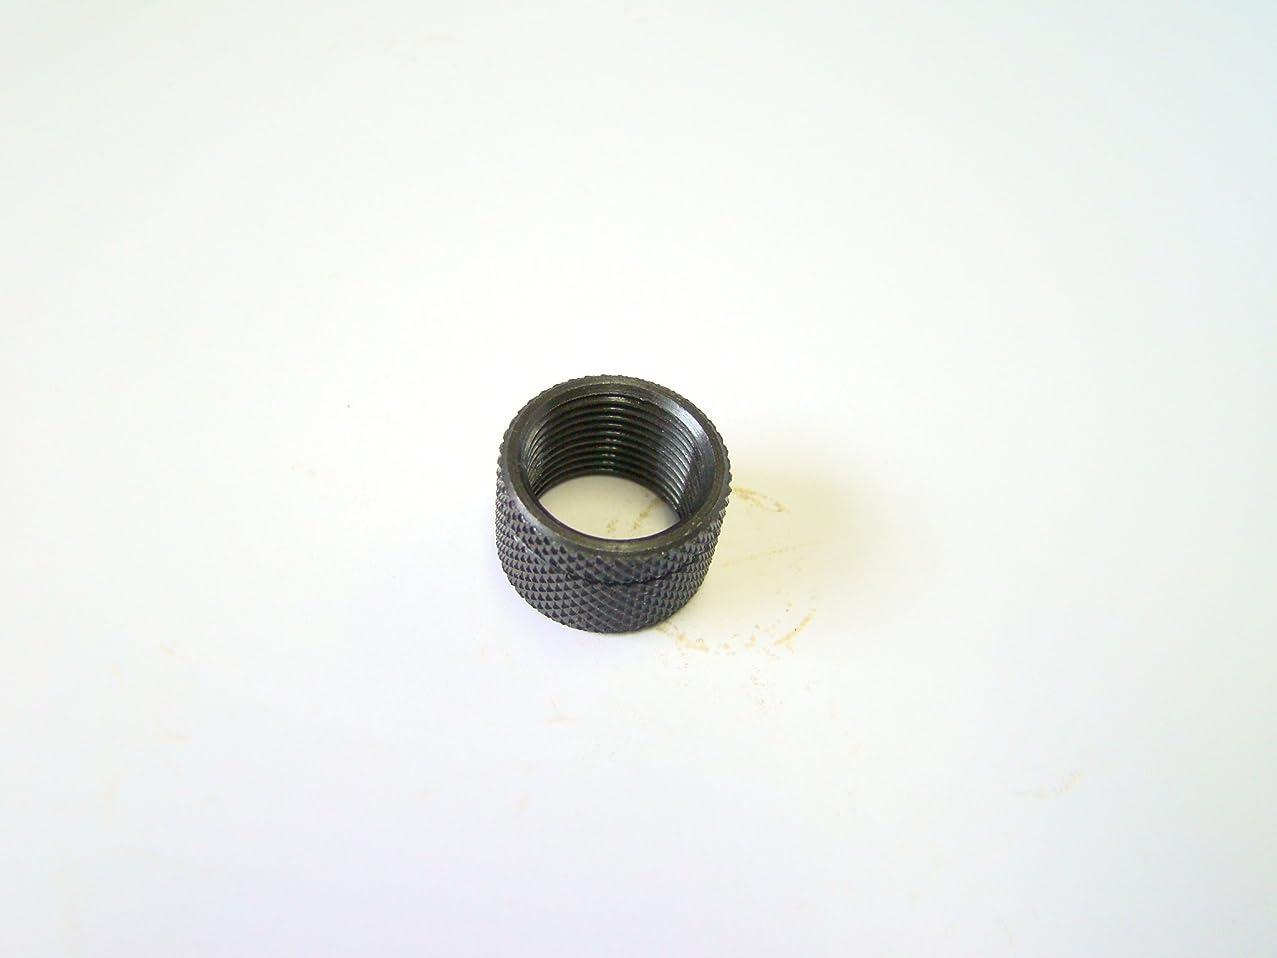 1/2-28 thread protector Black knerled .400 long